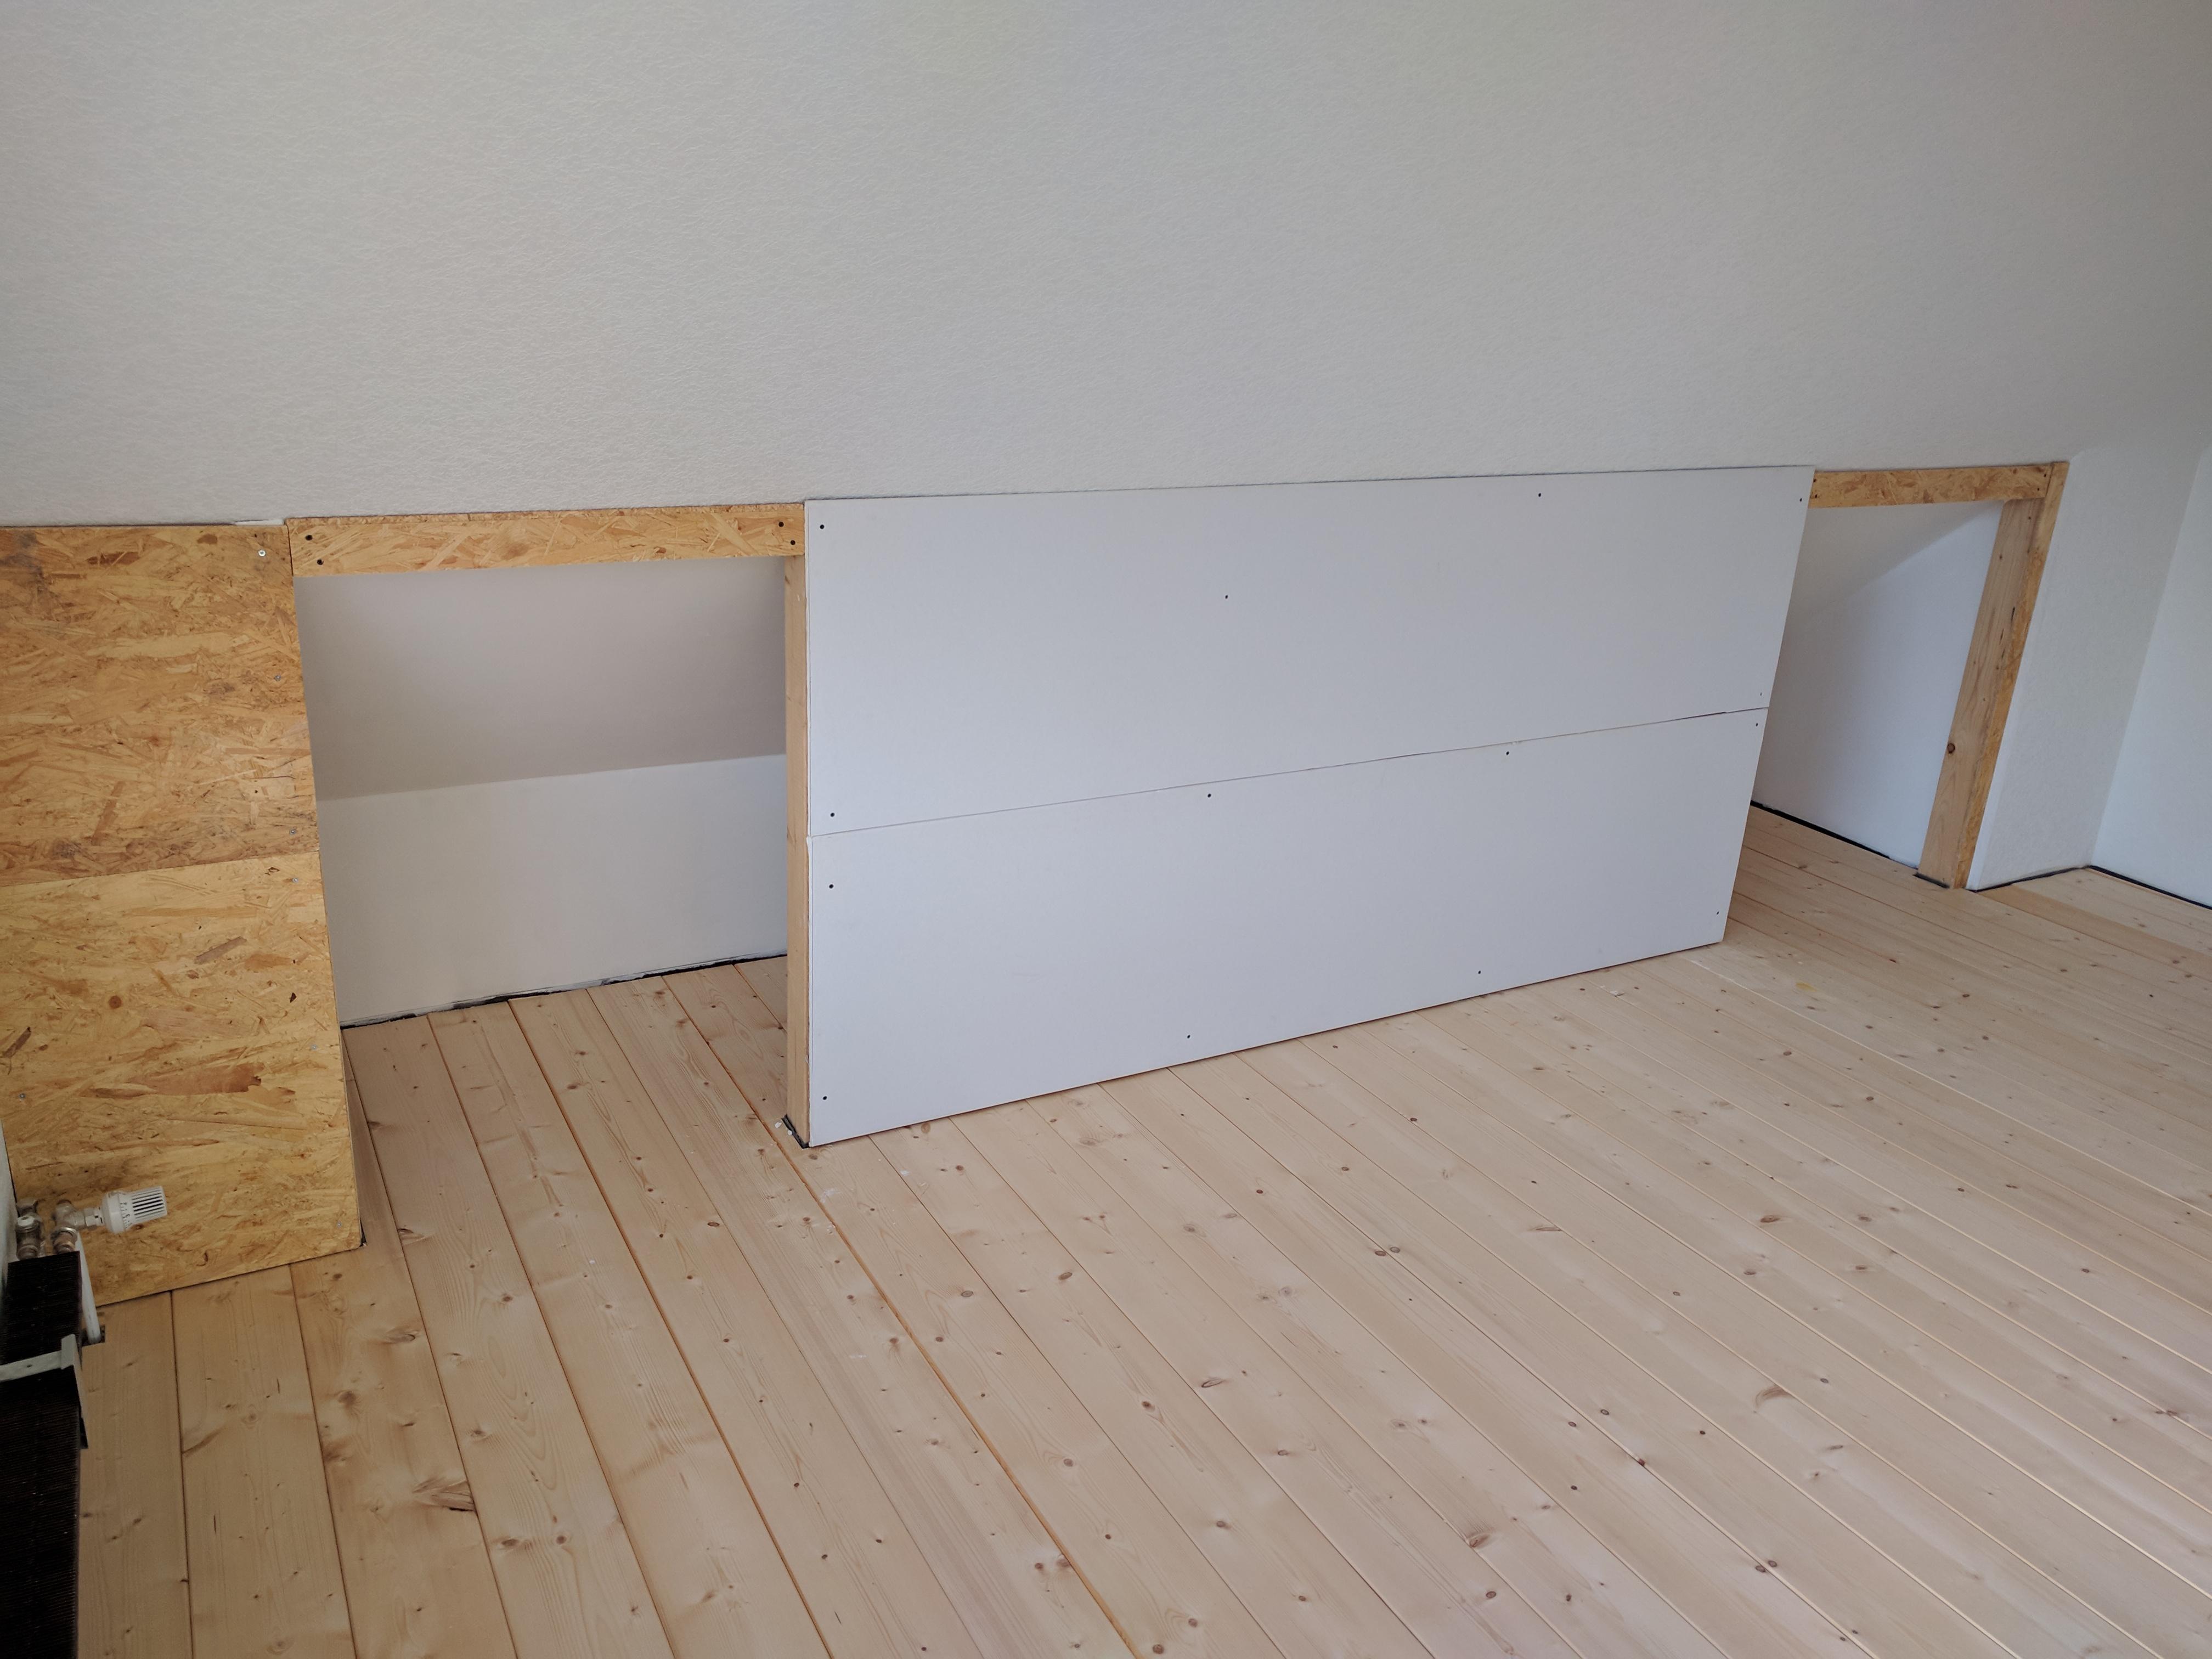 Holzfußboden Wachsen Oder ölen ~ Holzboden wachsen treppenstufen holz stahl befestigen bvrao